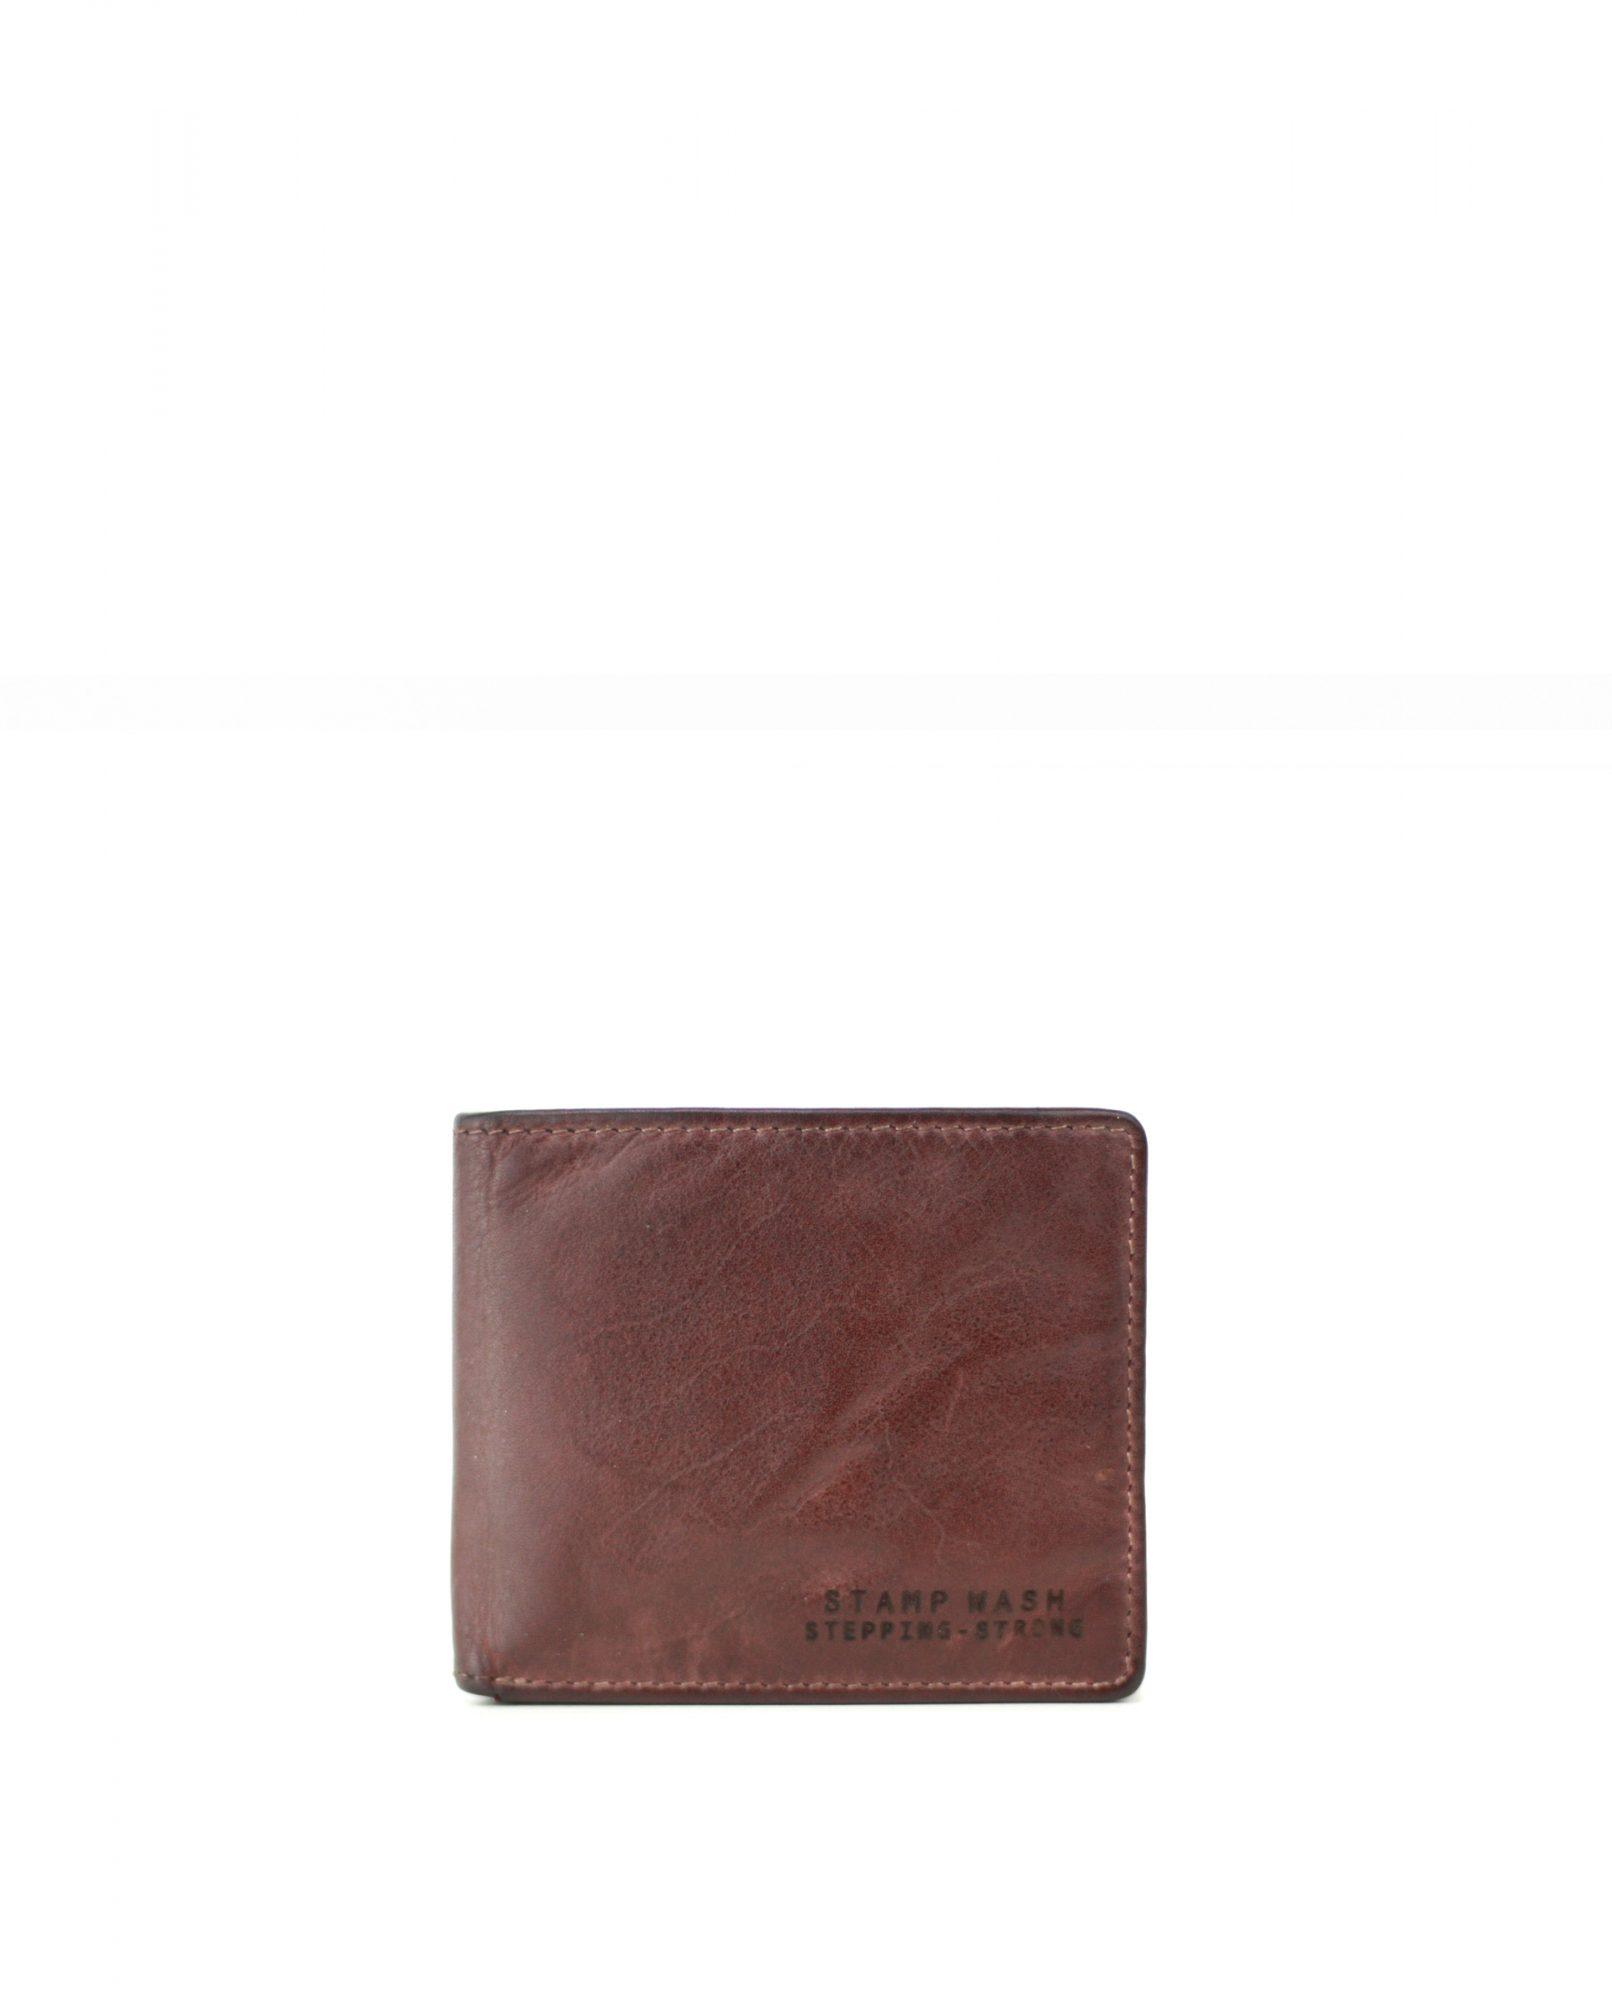 TICHI-Billetero de piel Stamp color líbano-MHST11992LB-STAMP